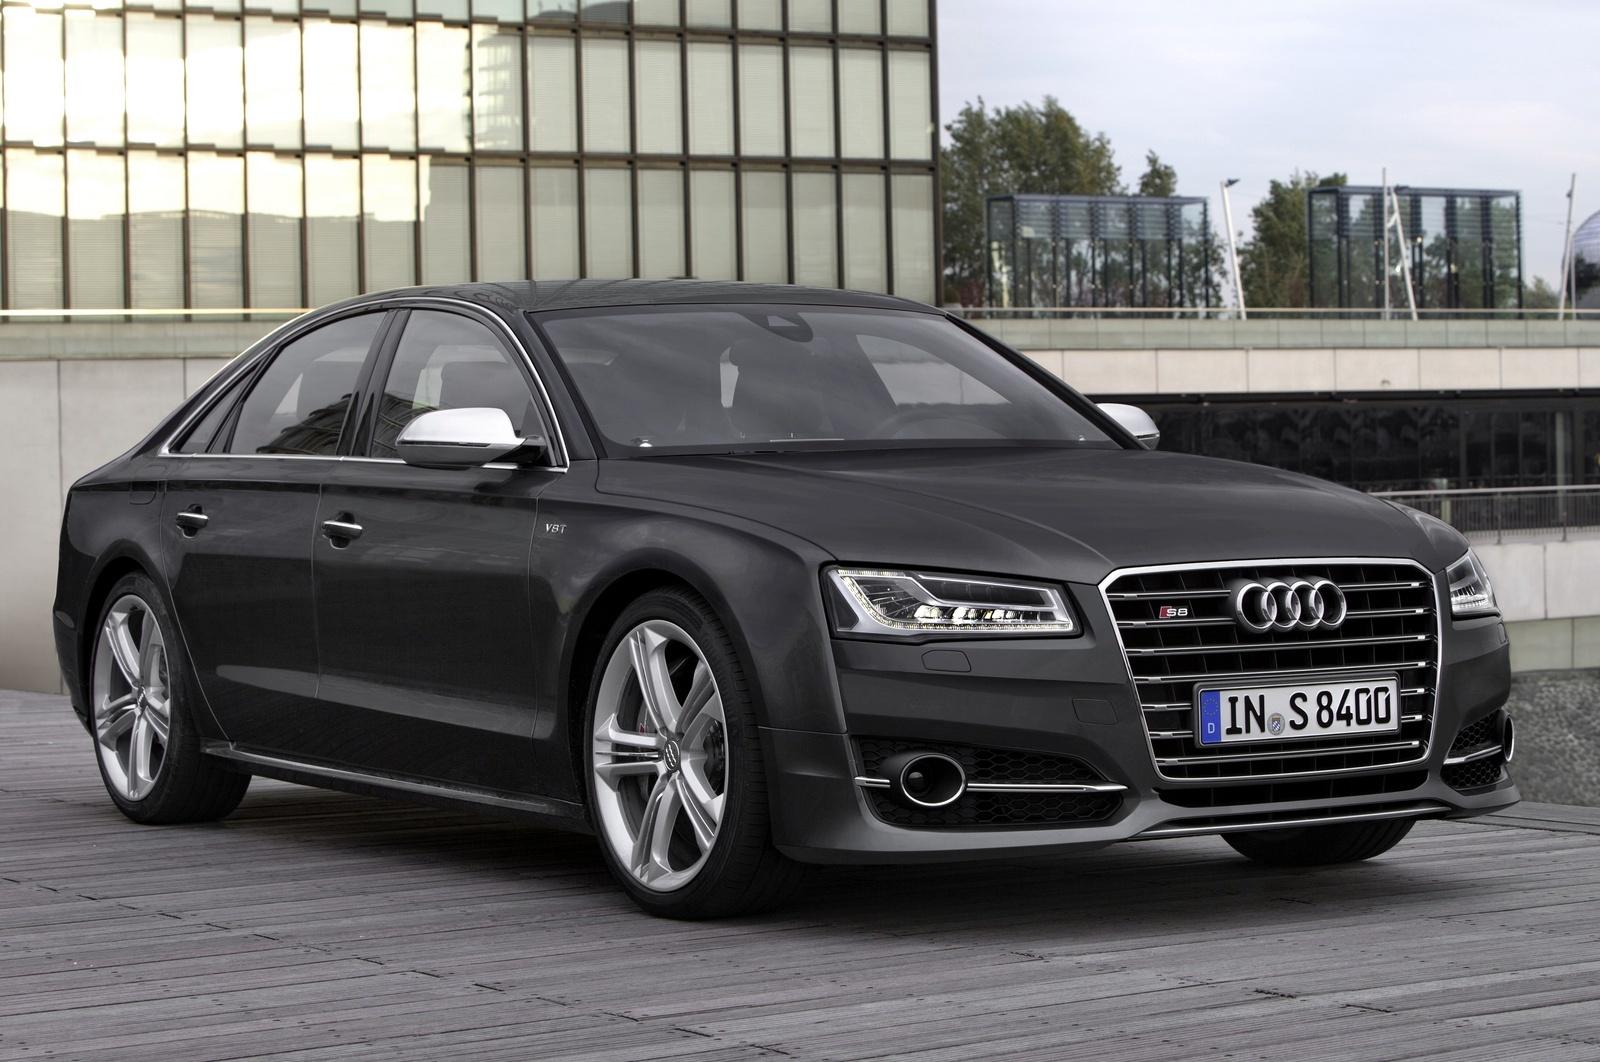 2014 Audi S8 - Overview - CarGurus